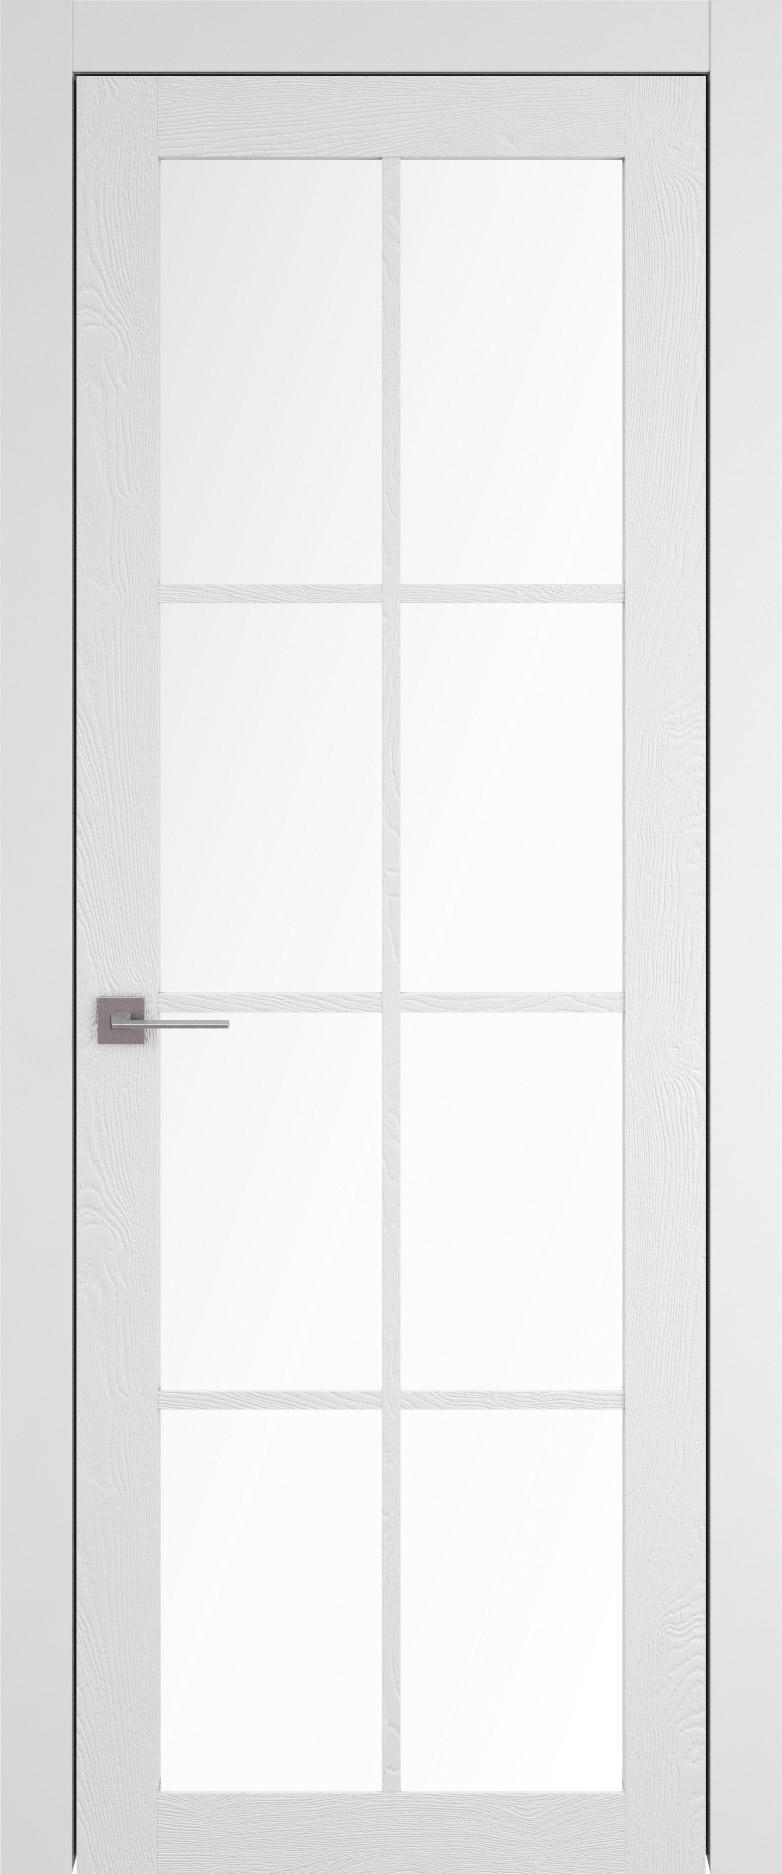 Tivoli З-5 цвет - Белая эмаль по шпону (RAL 9003) Со стеклом (ДО)